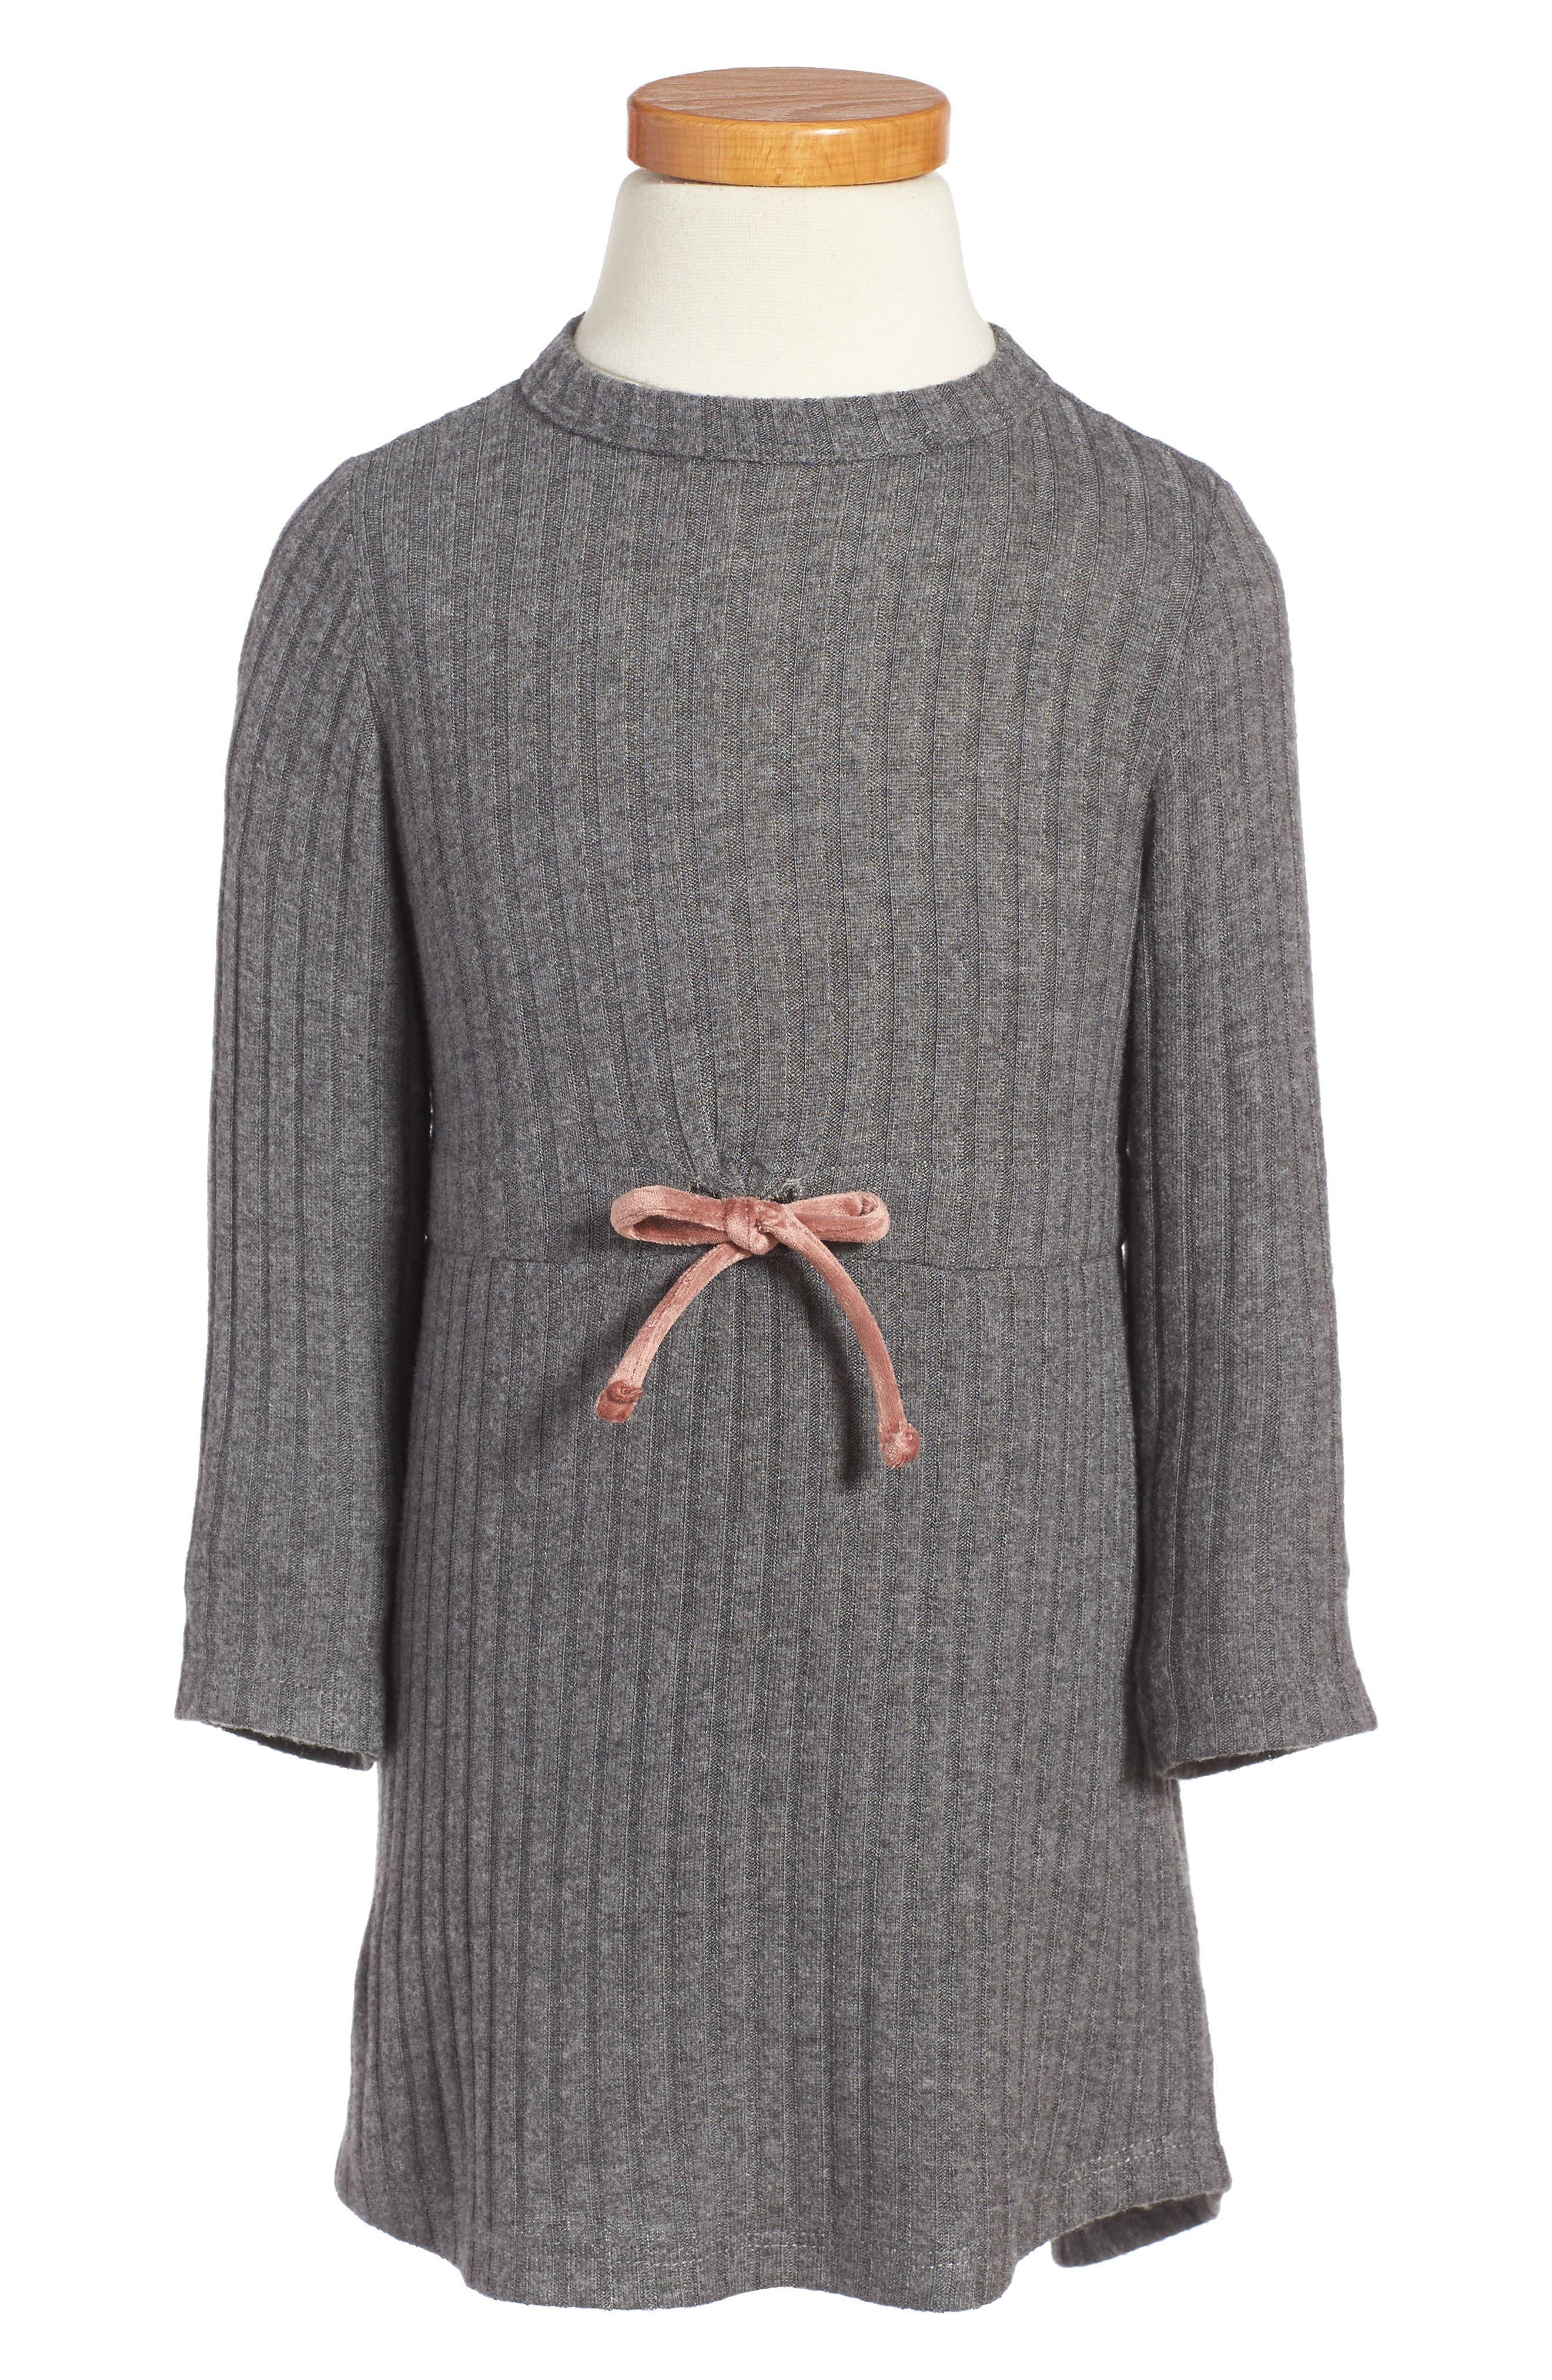 Ellana Ribbed Sweater Dress,                         Main,                         color, Charcoal Rib